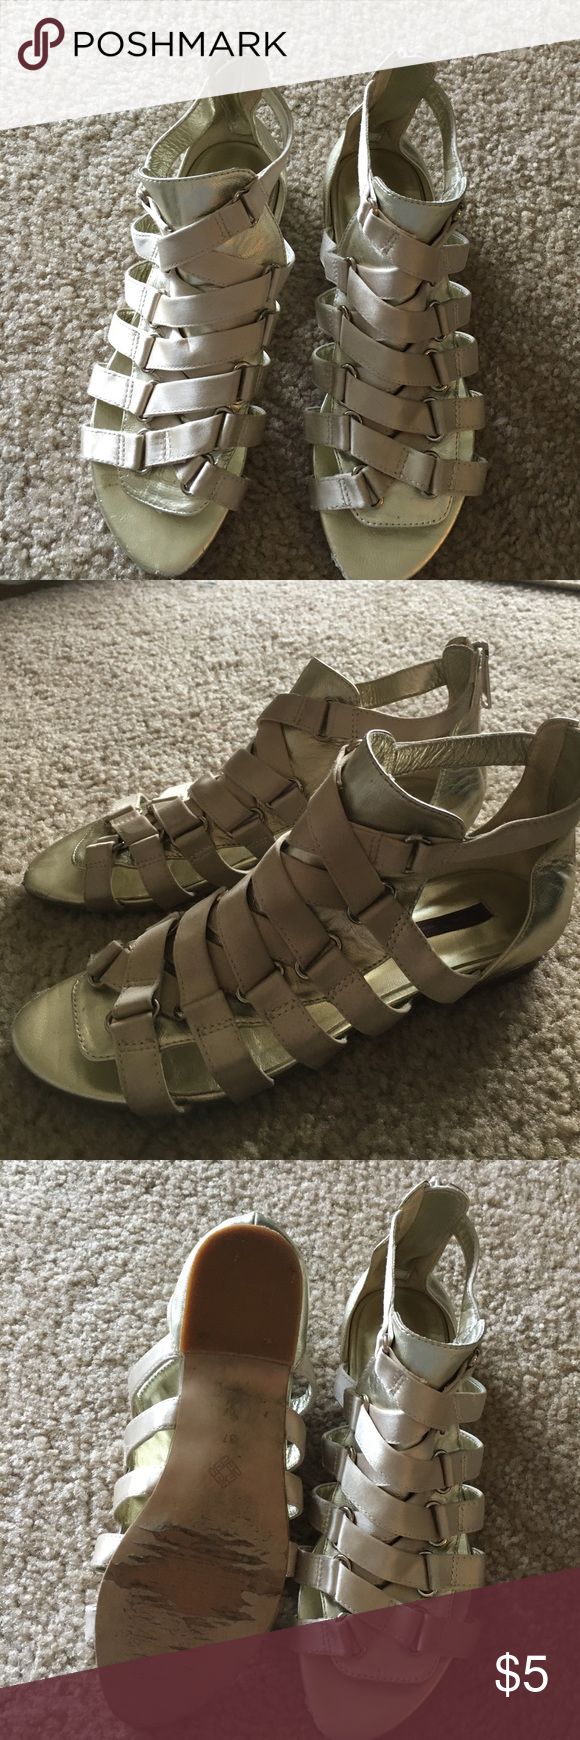 Gold sandals Gold strappy sandals. Low gladiator style Elegant Prosper Shoes Sandals